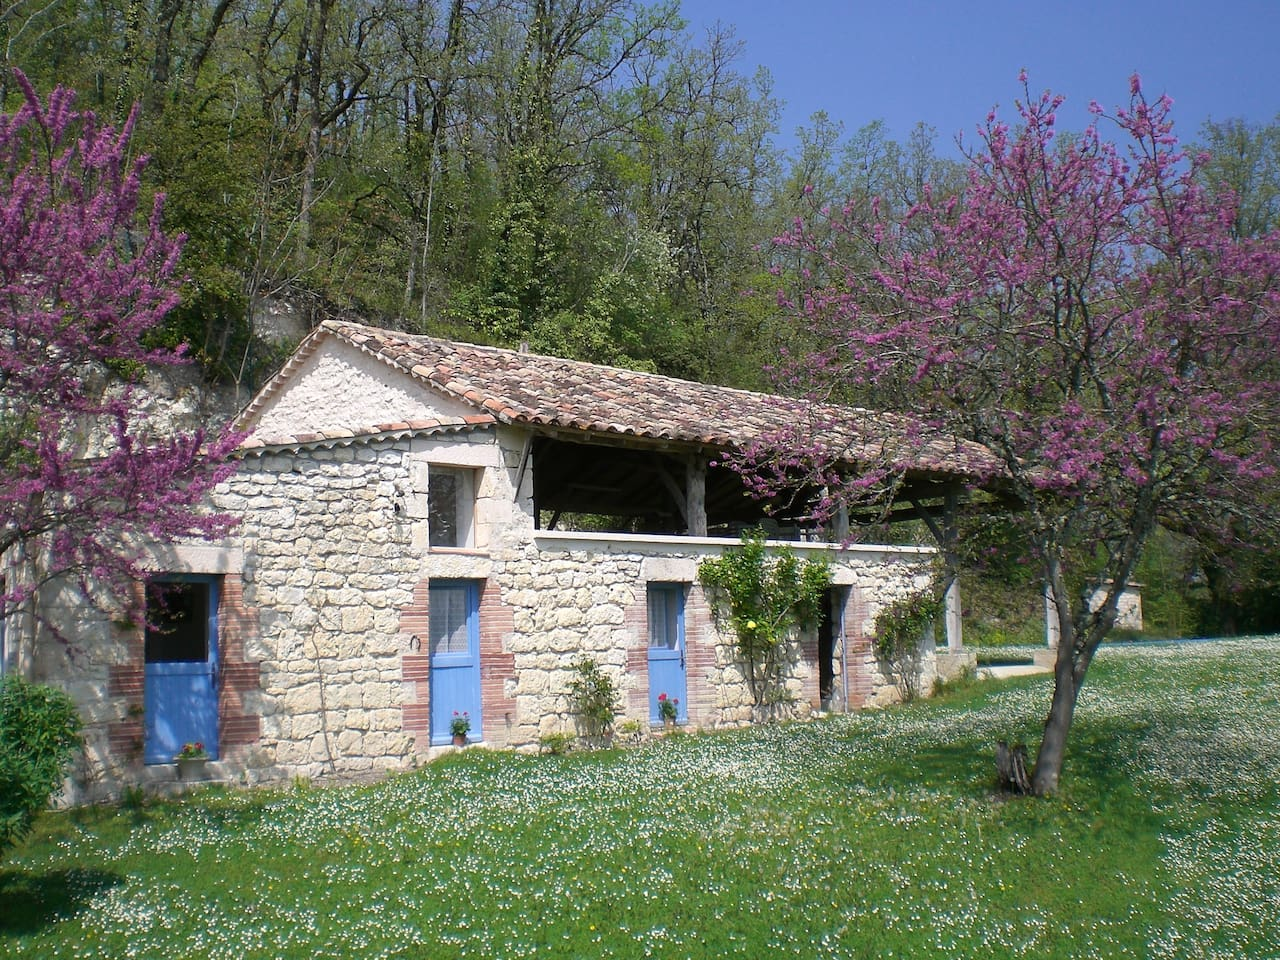 La Petite Grange au printemps. Spring sunshine.